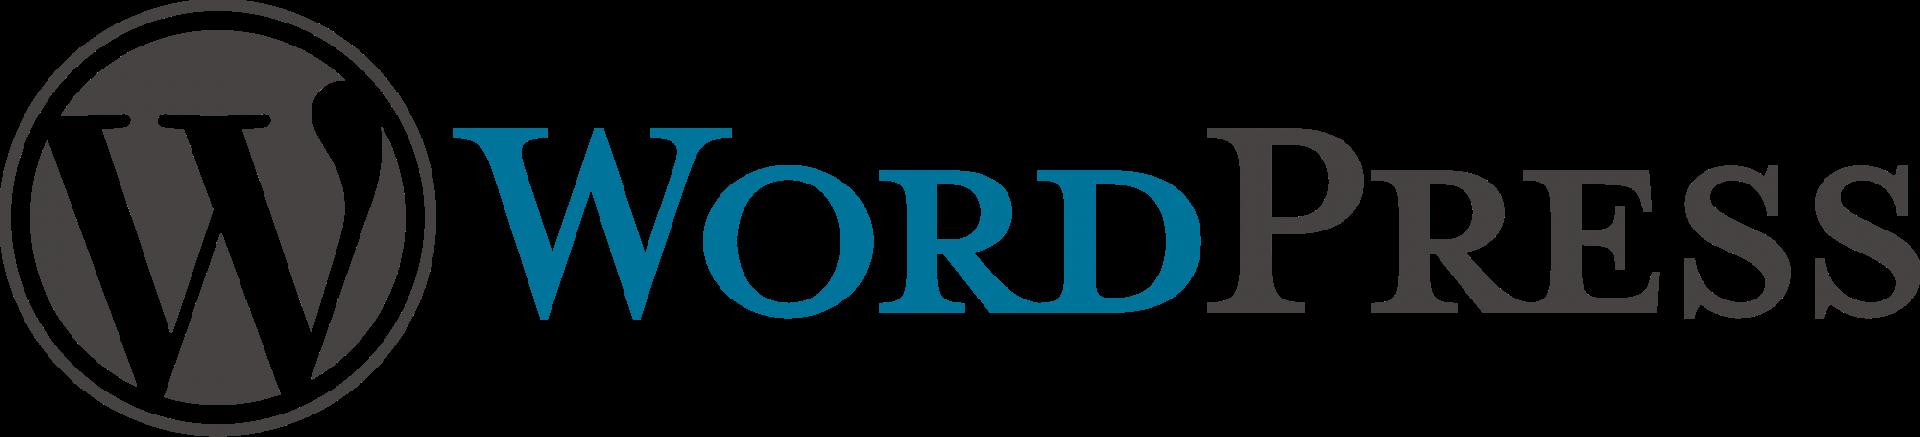 Wordpress : CMS open-source